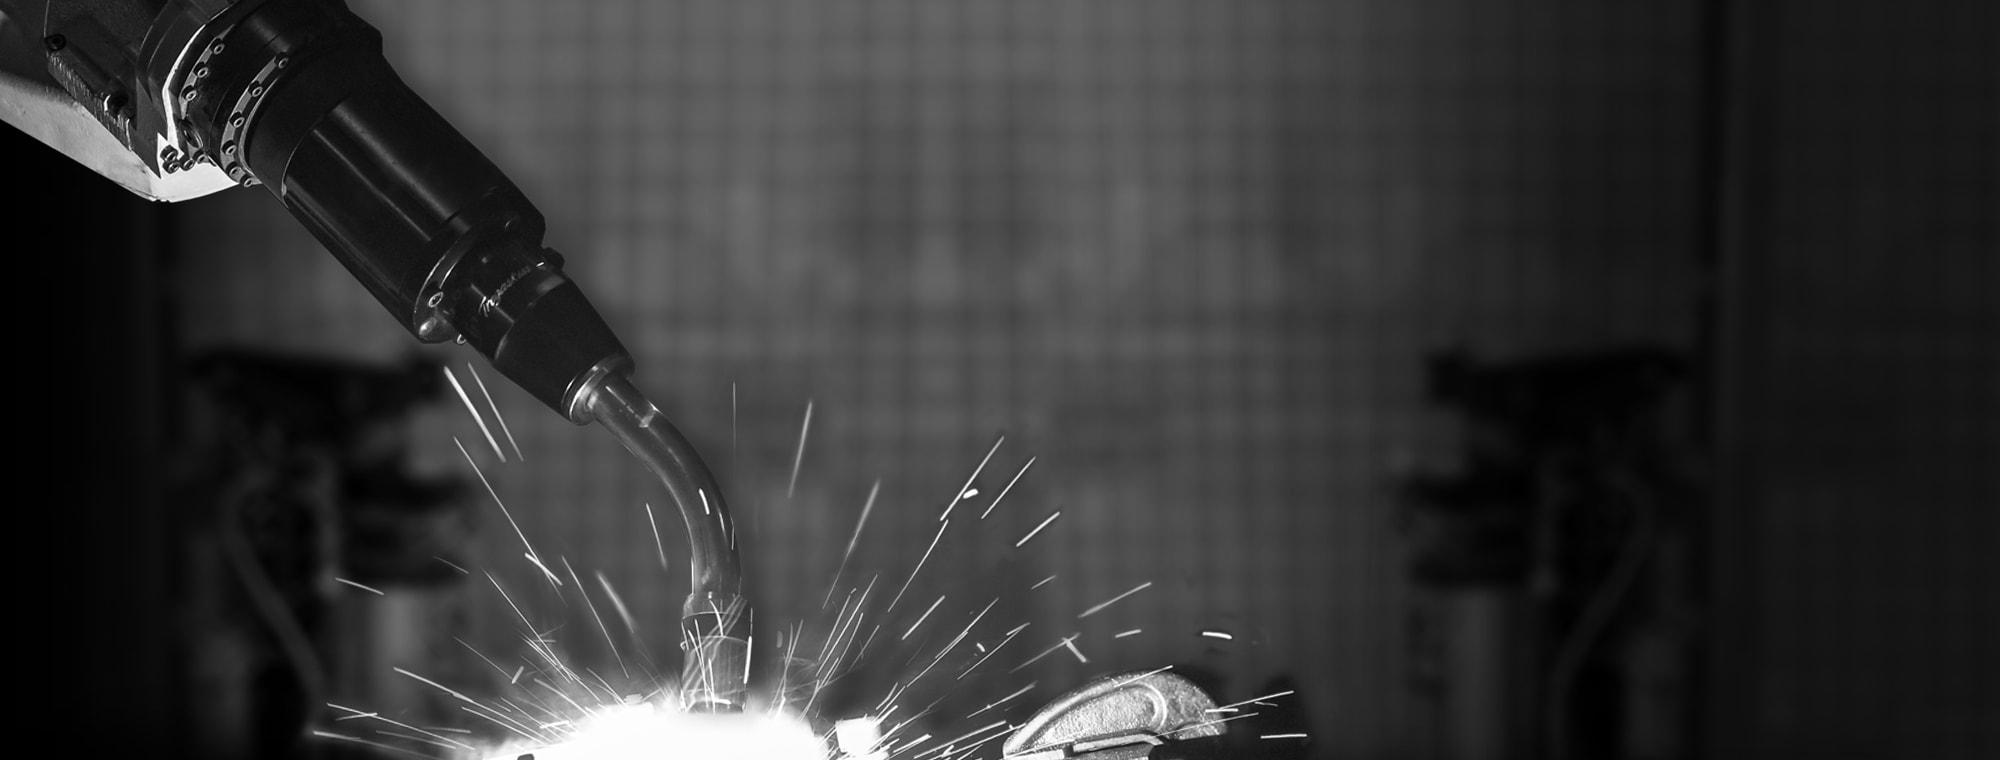 Tregaskiss robotic MIG gun live welding